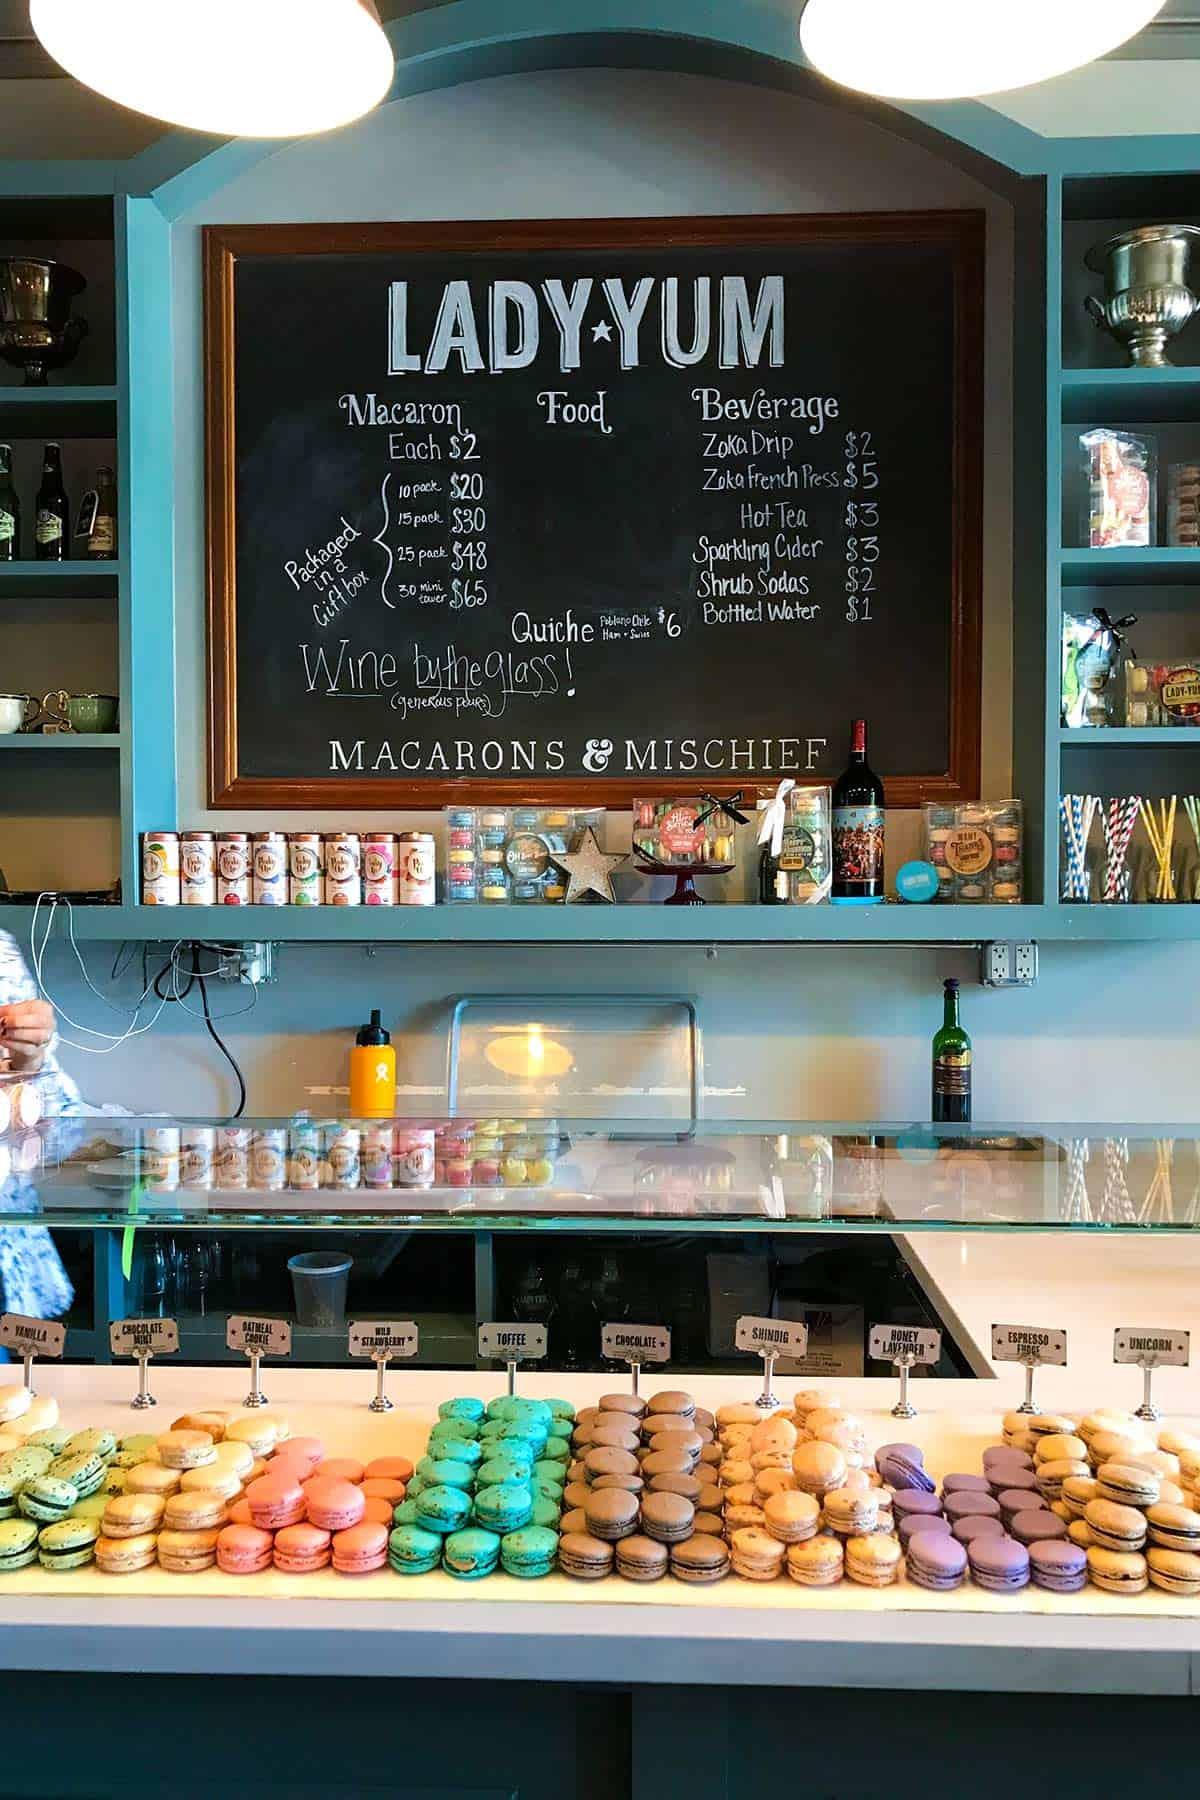 Things to Do in Kirkland, WA: Visit Lady Yum!